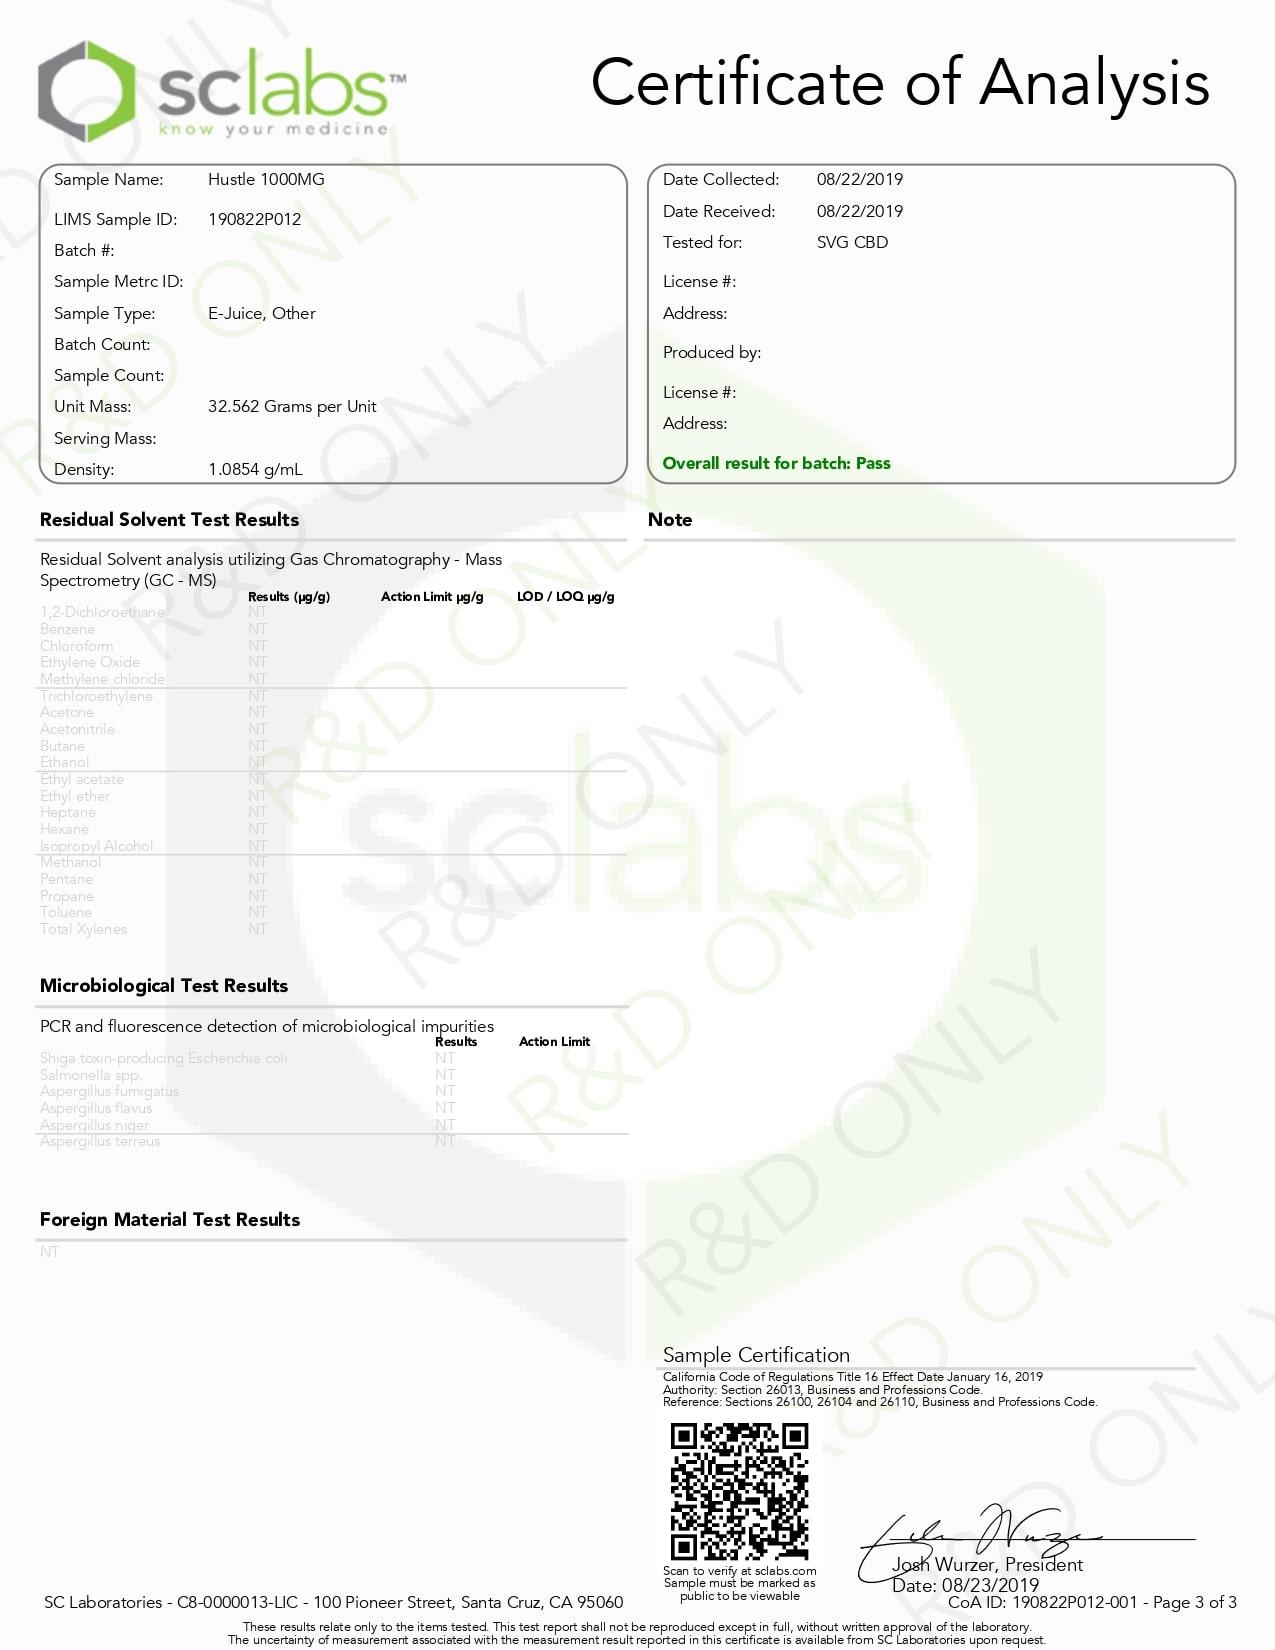 SAVAGE Hustle CBD Vape Juice 1000mg Lab Report